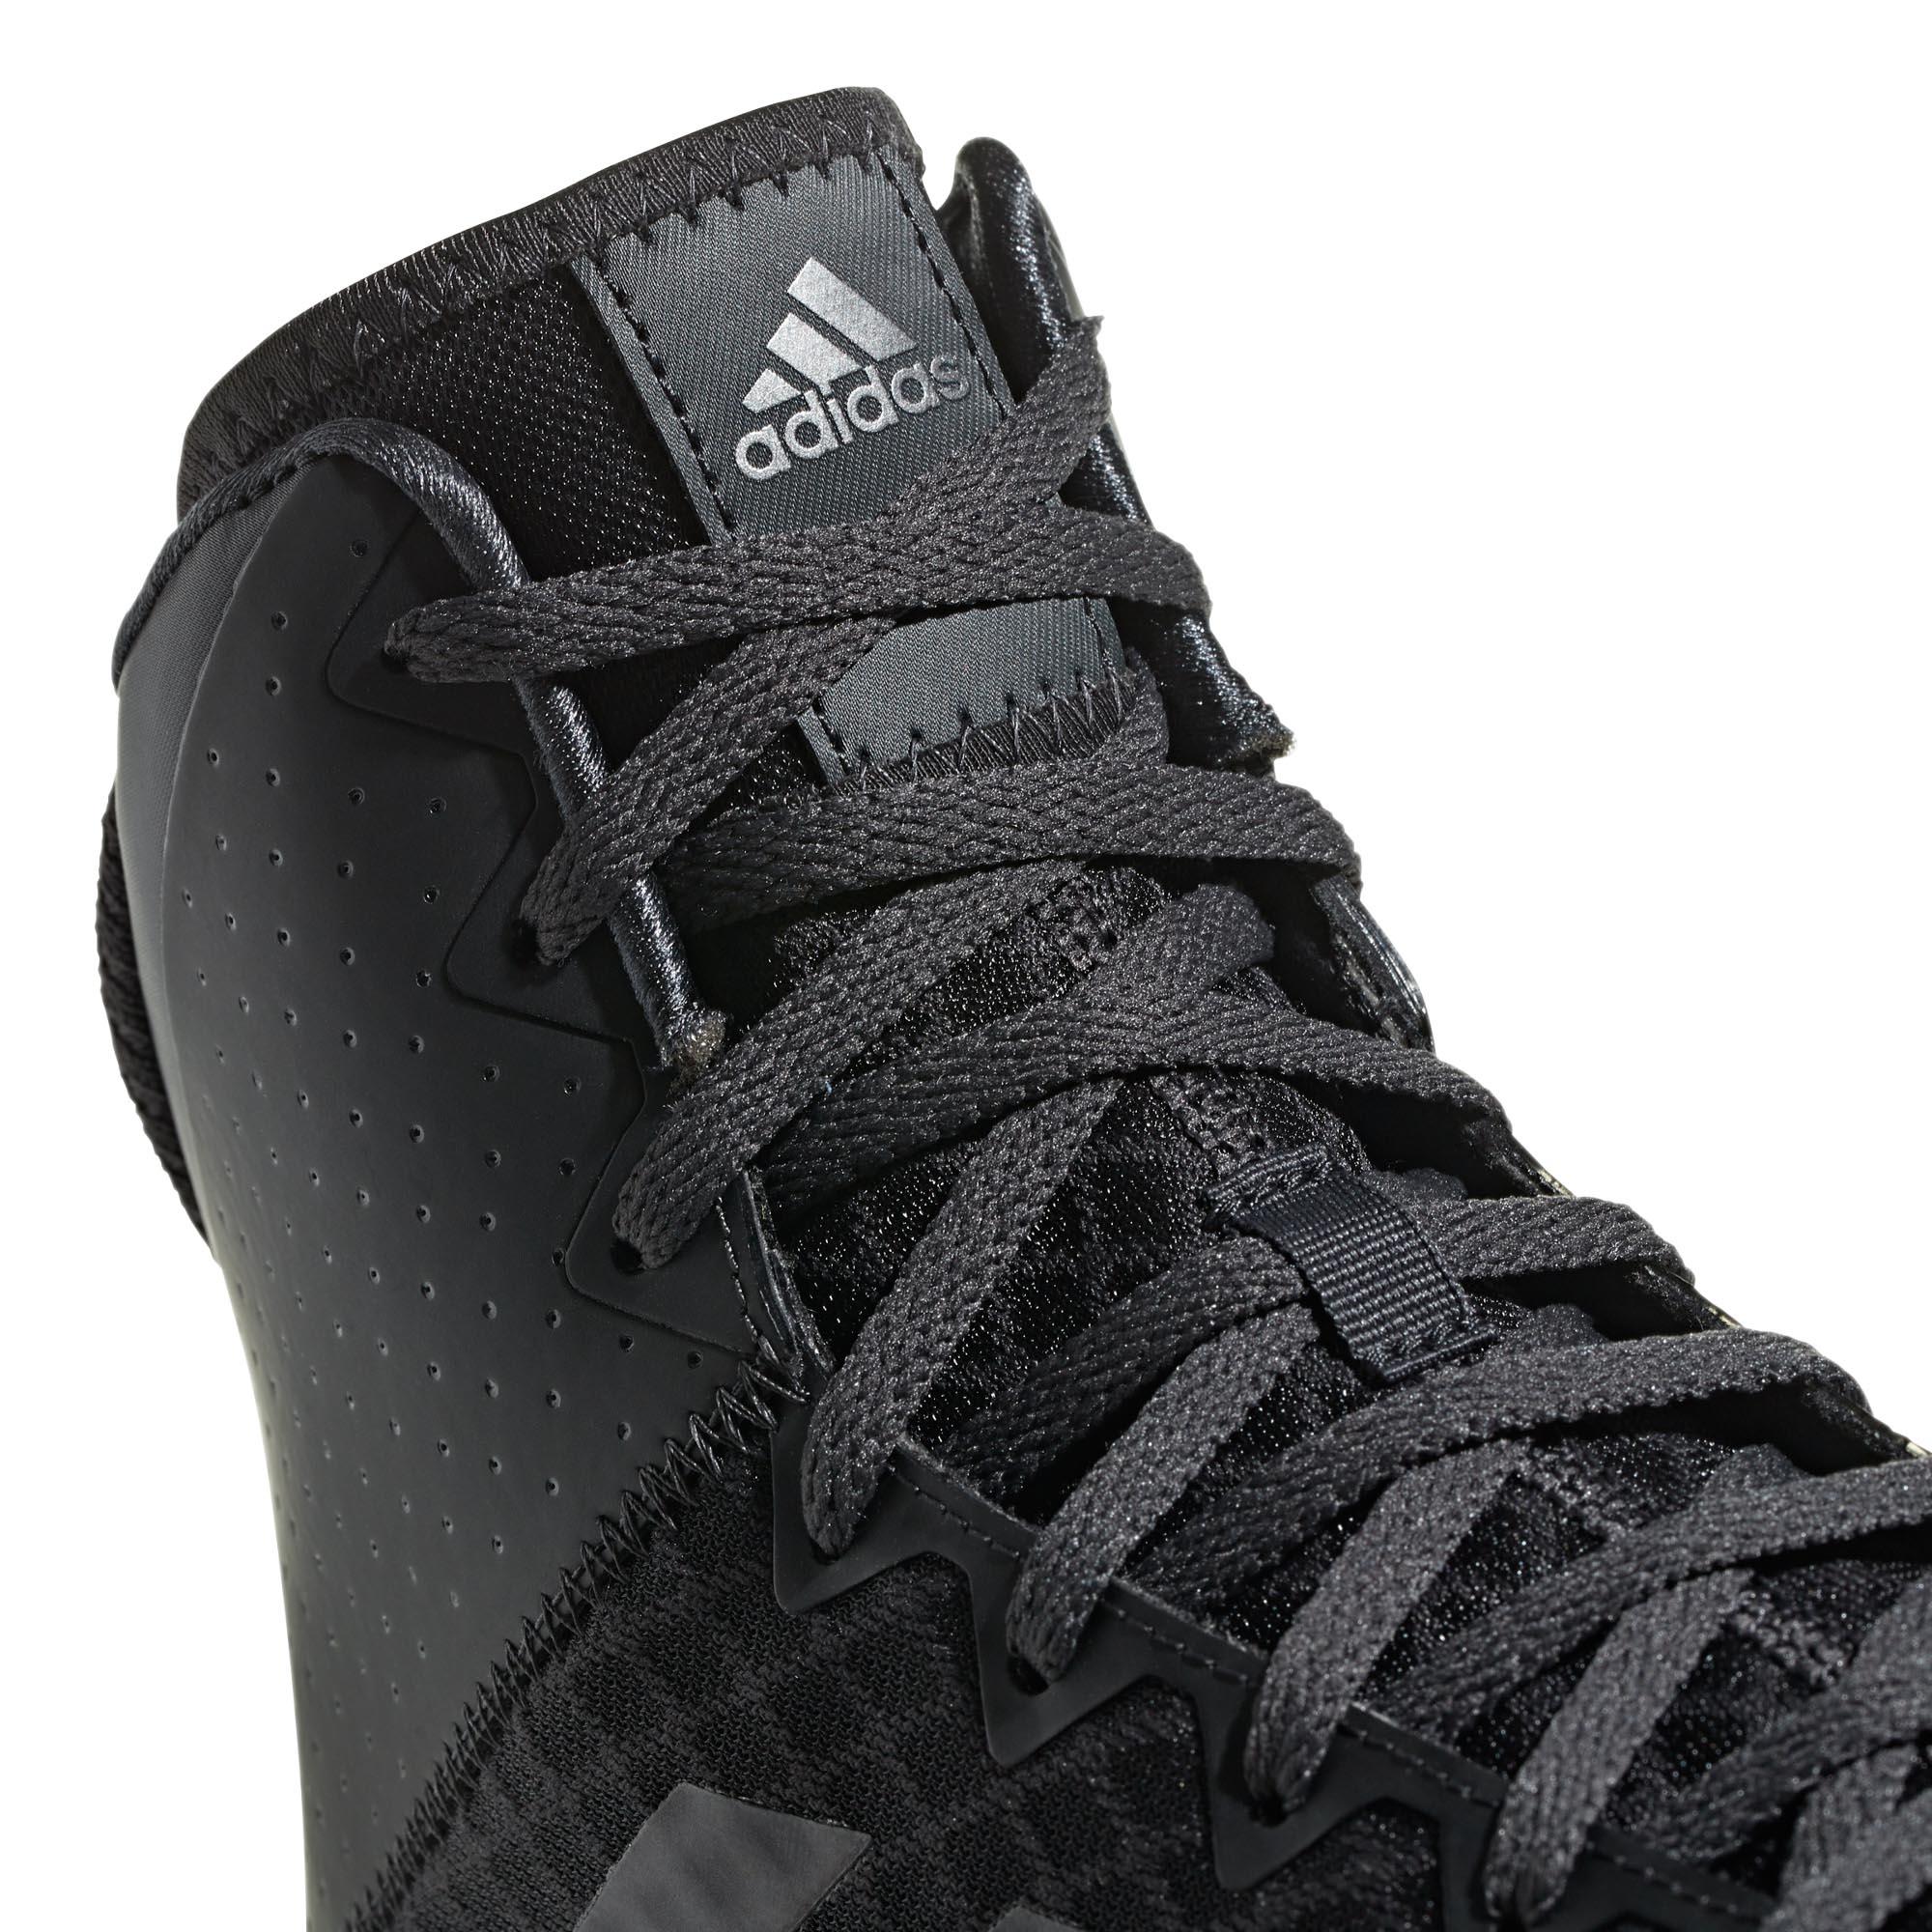 miniature 8 - Adidas Mat Wizard 4 homme adulte lutte Trainer Shoe Boot Noir